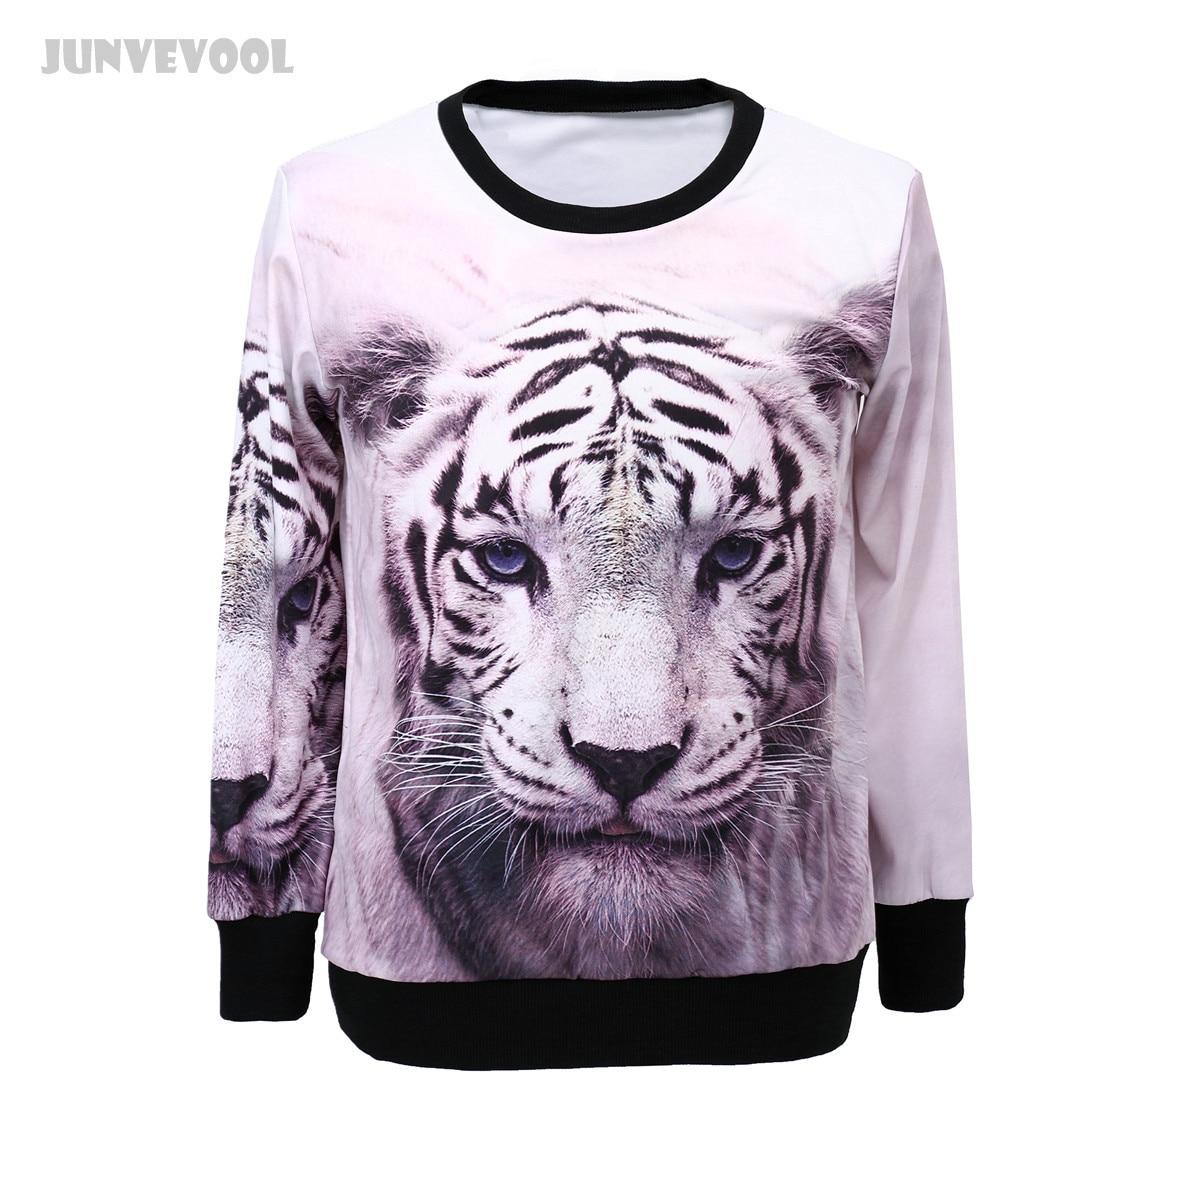 84748415faff Trainingspak Vrouwen Funky Women Sweatshirts Long Sleeve Hoodie 3D Tiger  Sweatshirt Animal Casual Round Neck Coat Pullover Tops